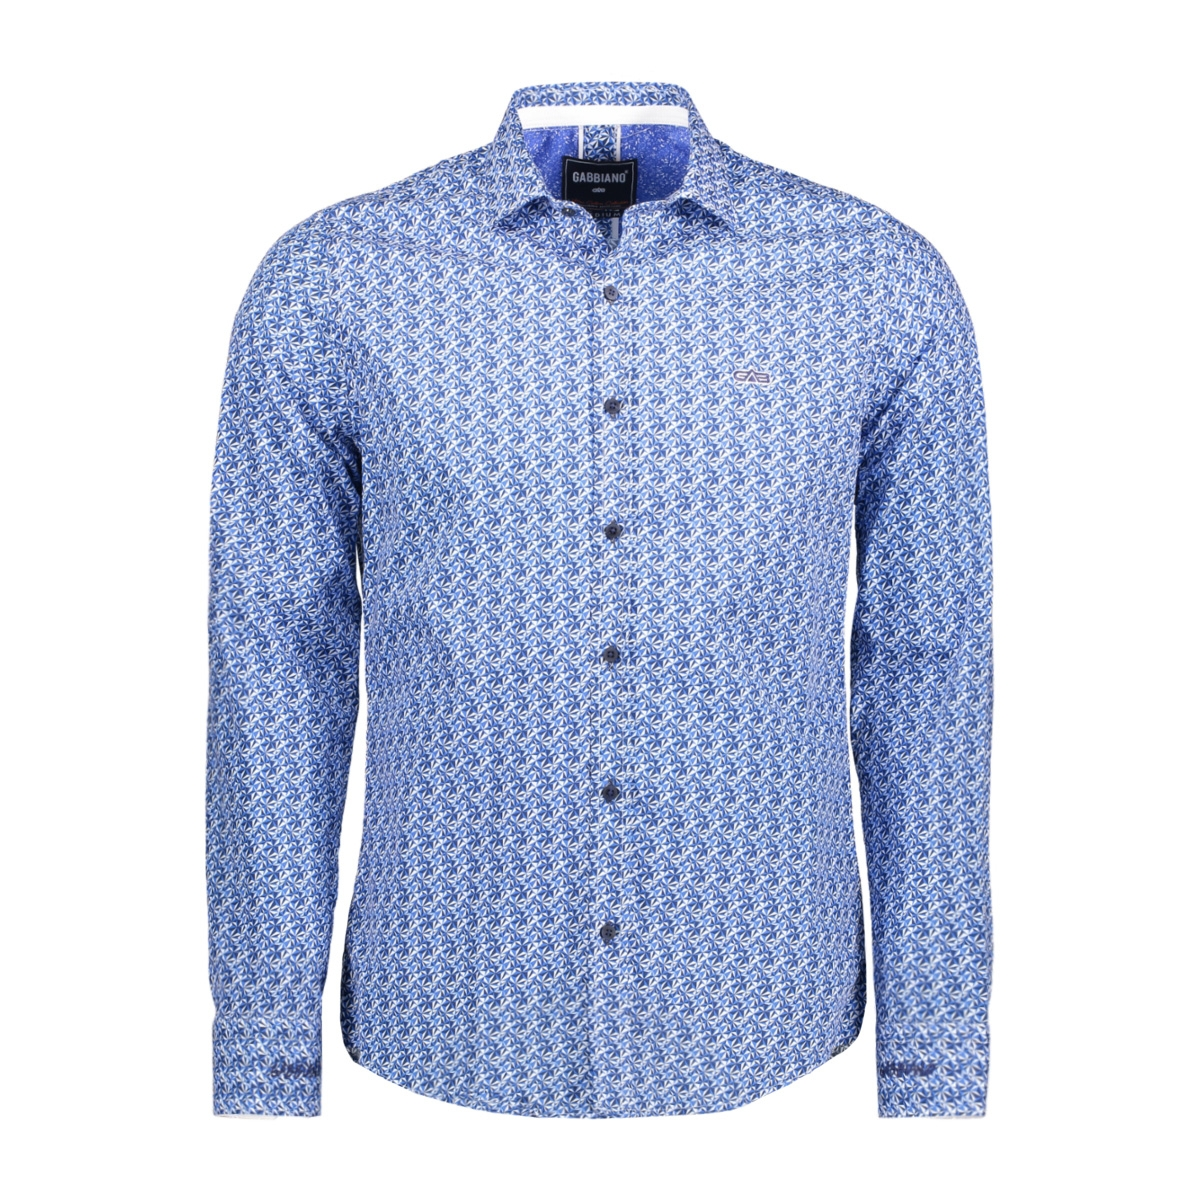 32665 gabbiano overhemd d14